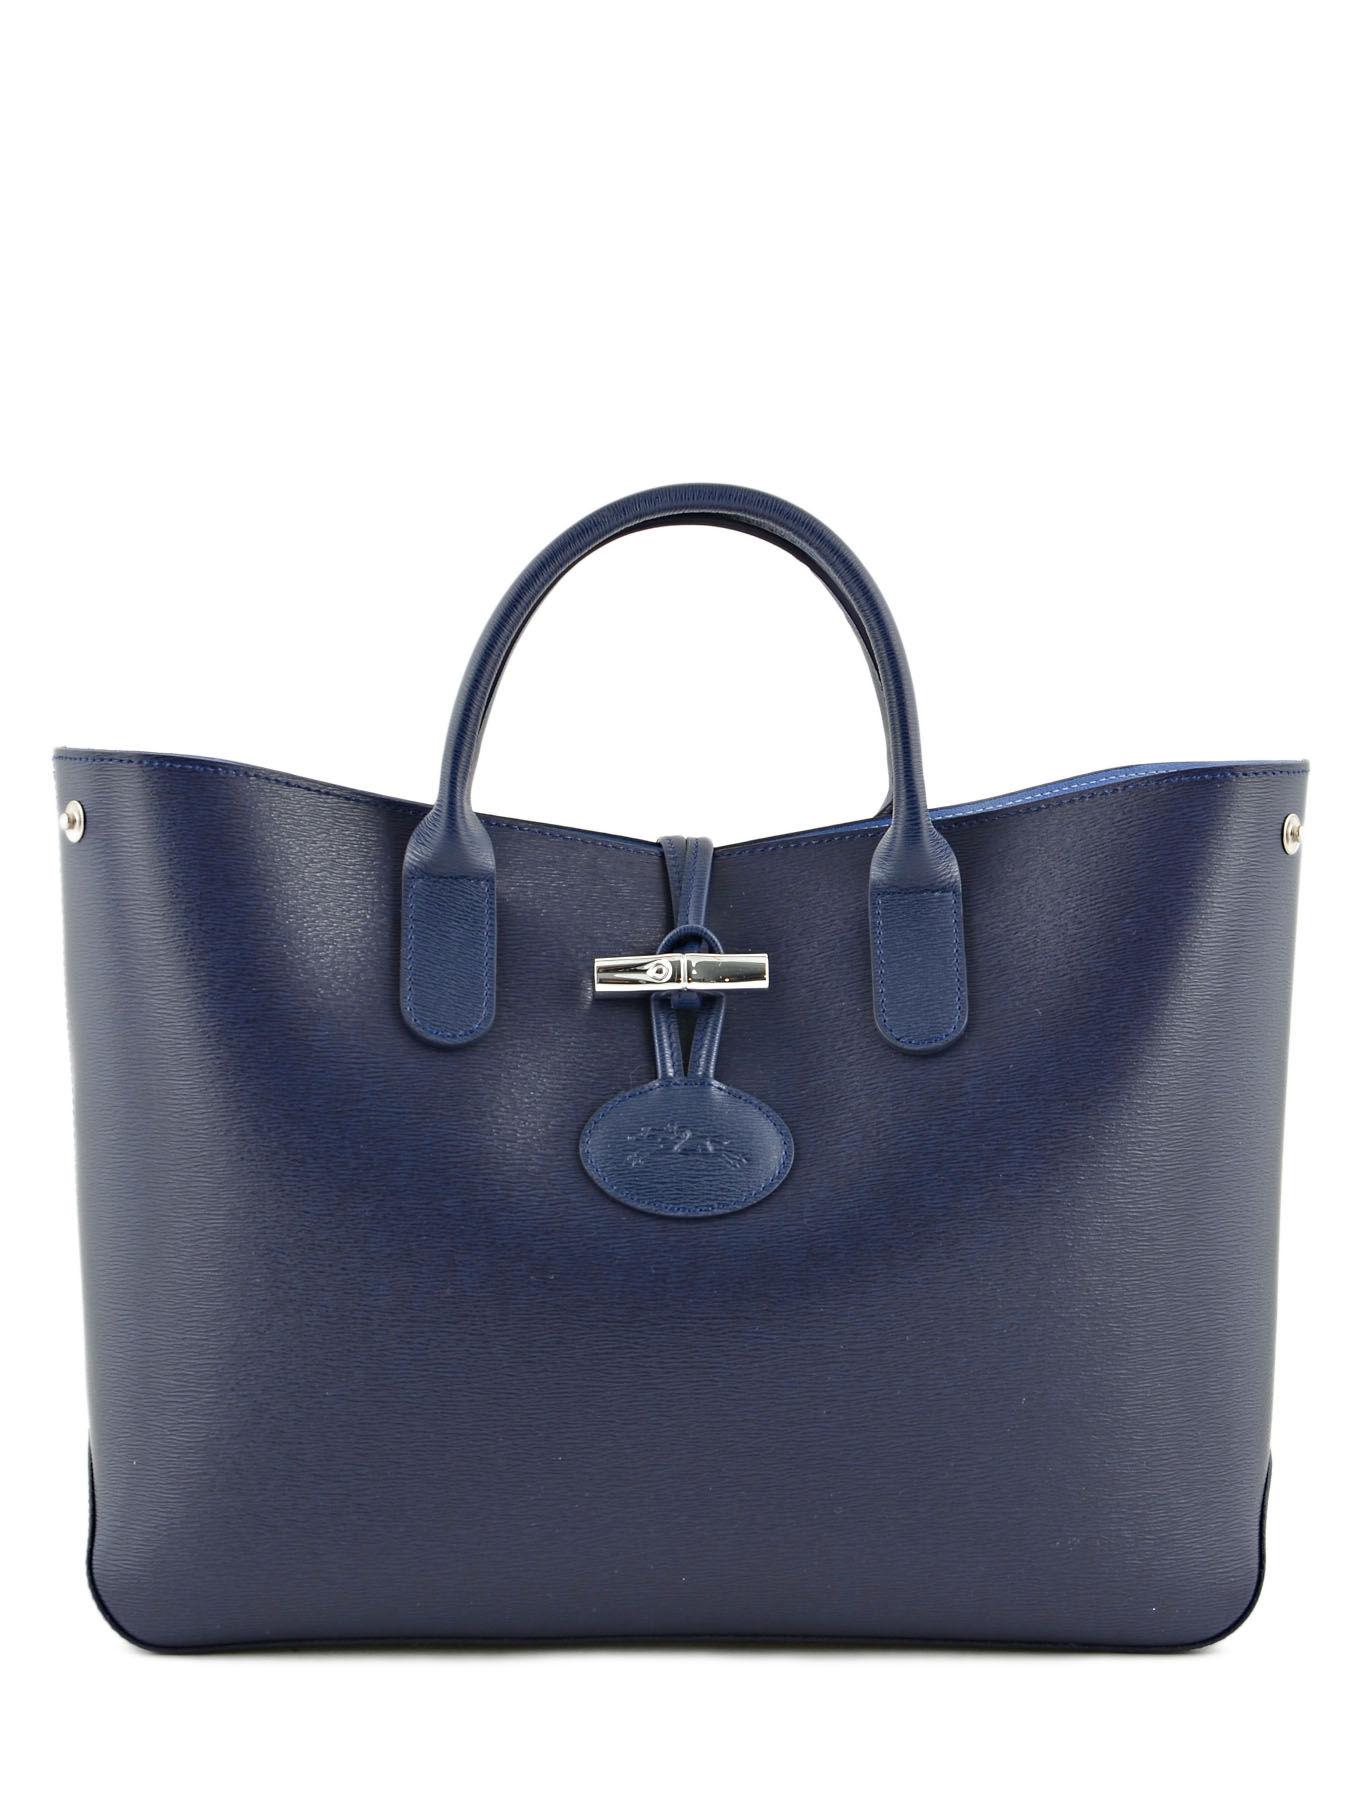 Sac à Main Bleu Longchamp : Sac port main longchamp roseau en vente au meilleur